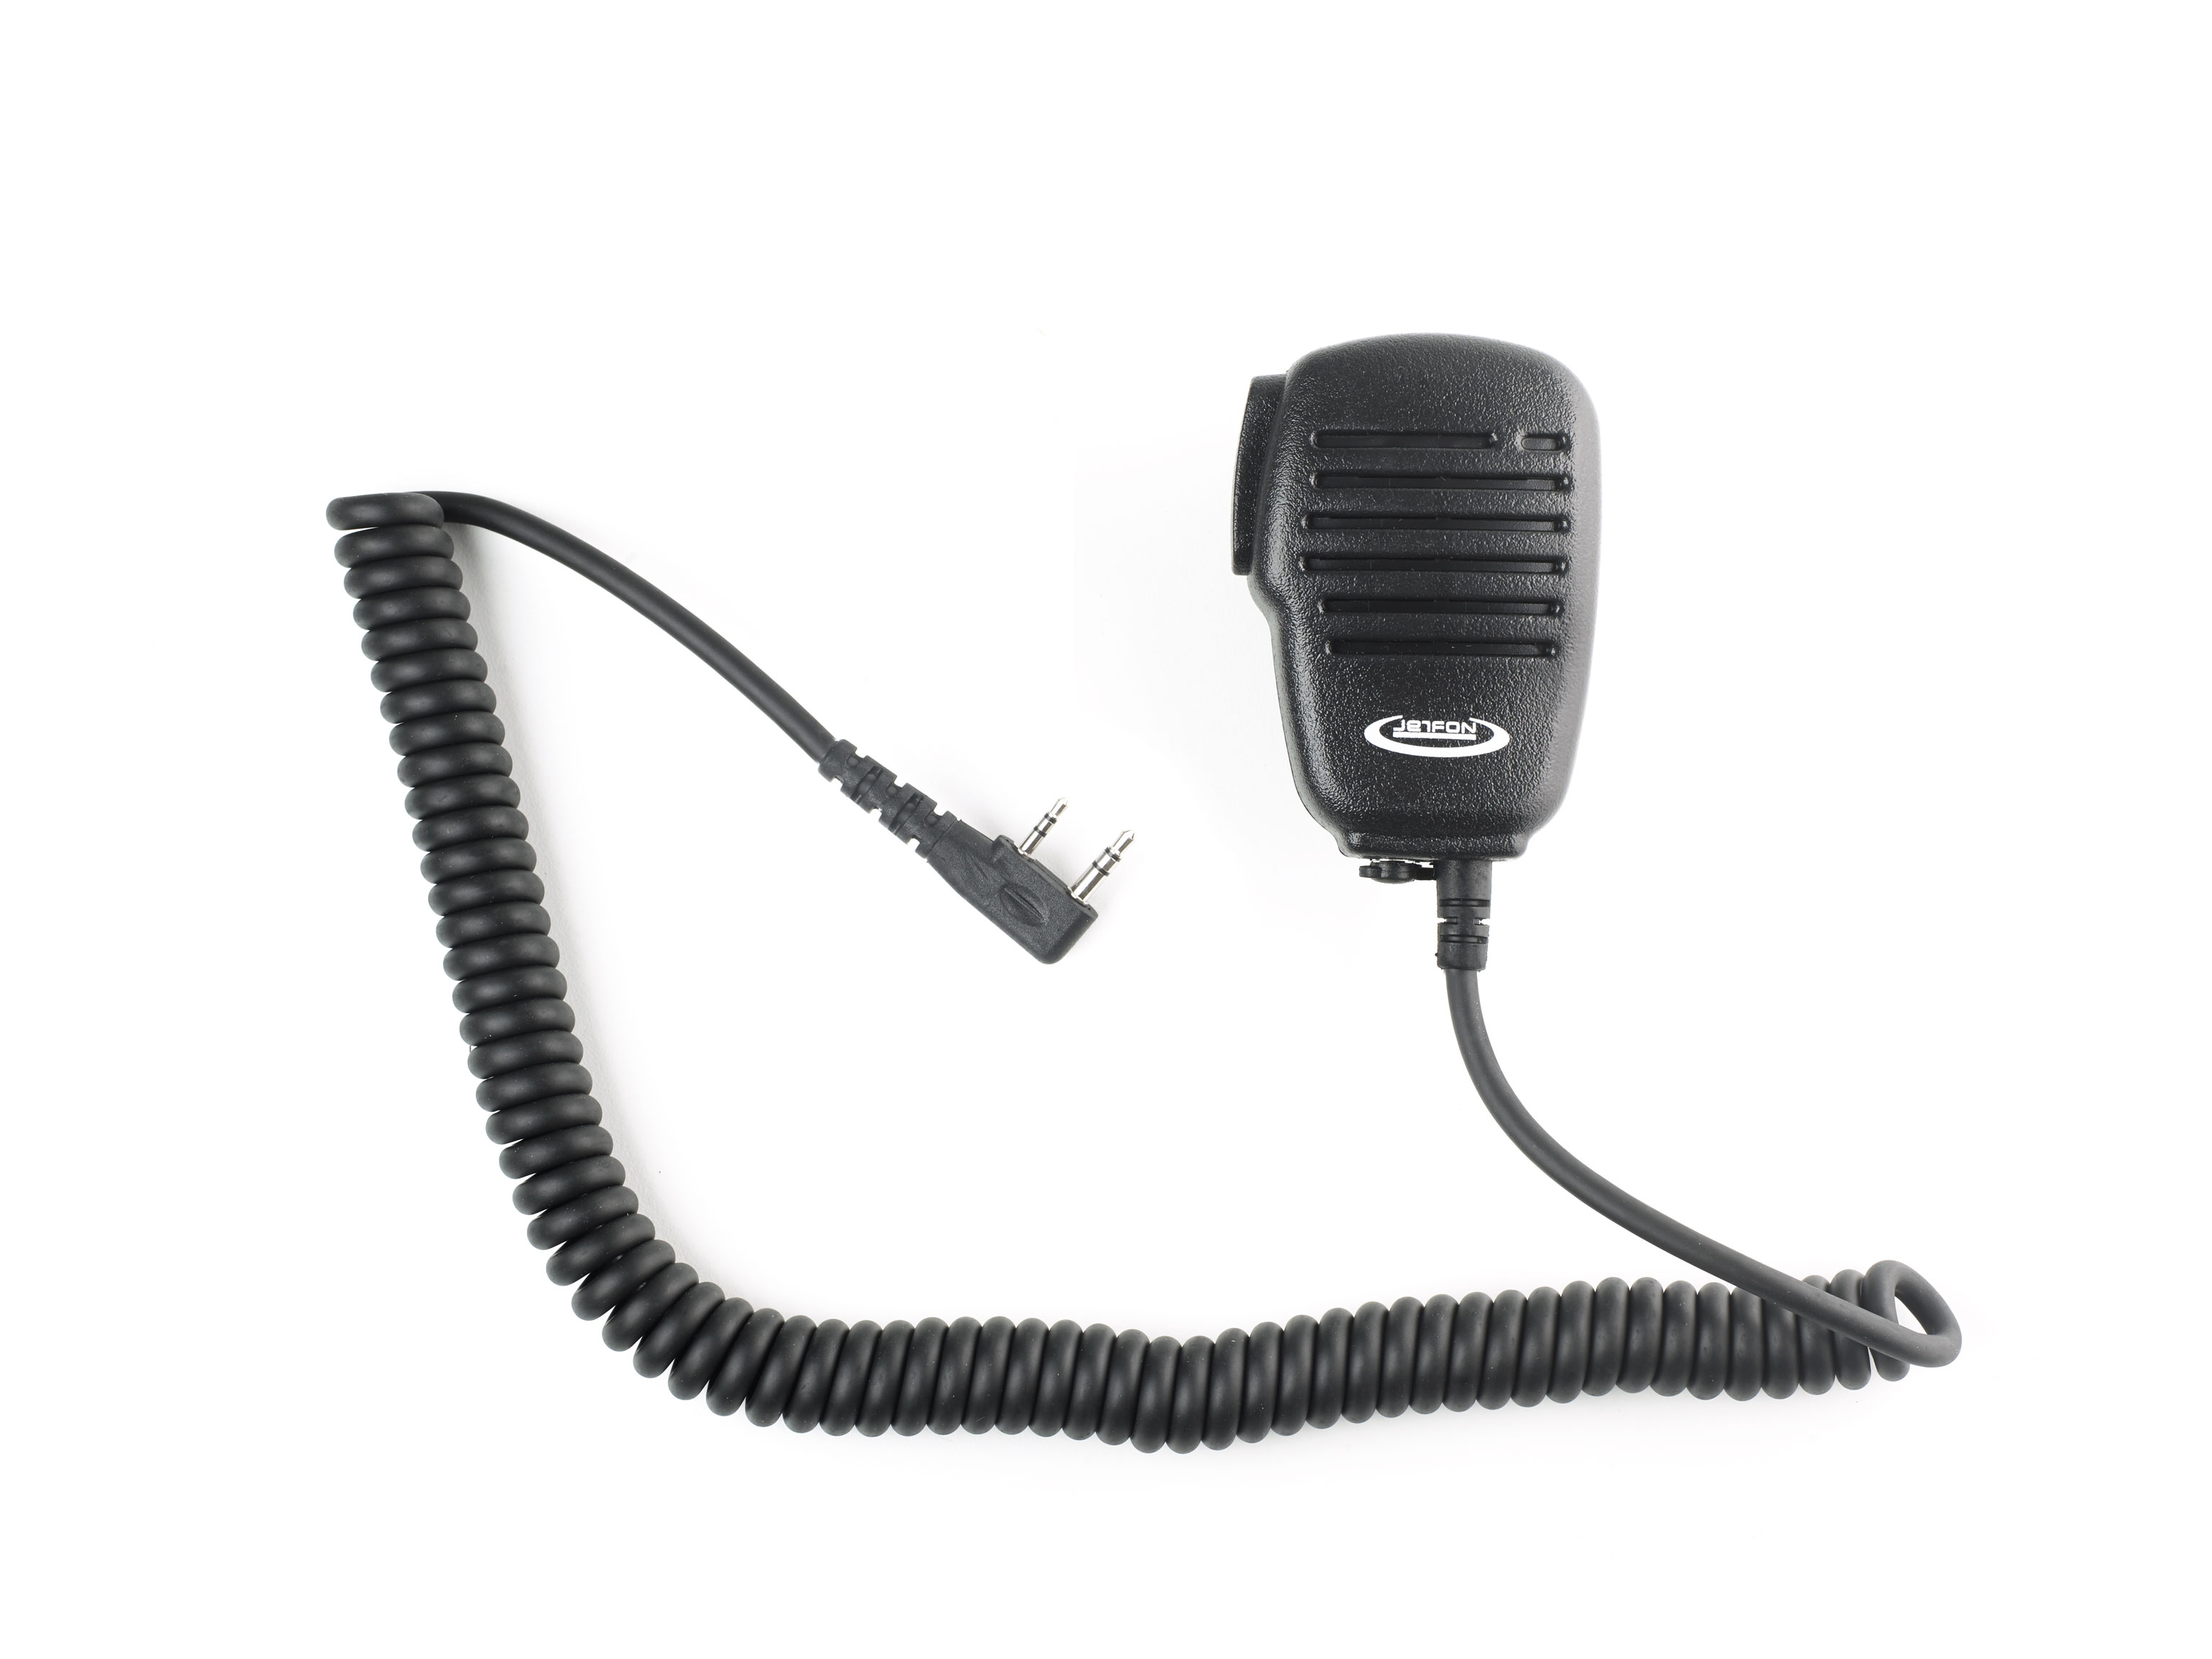 Microaltavoz Jetfon JR-4002